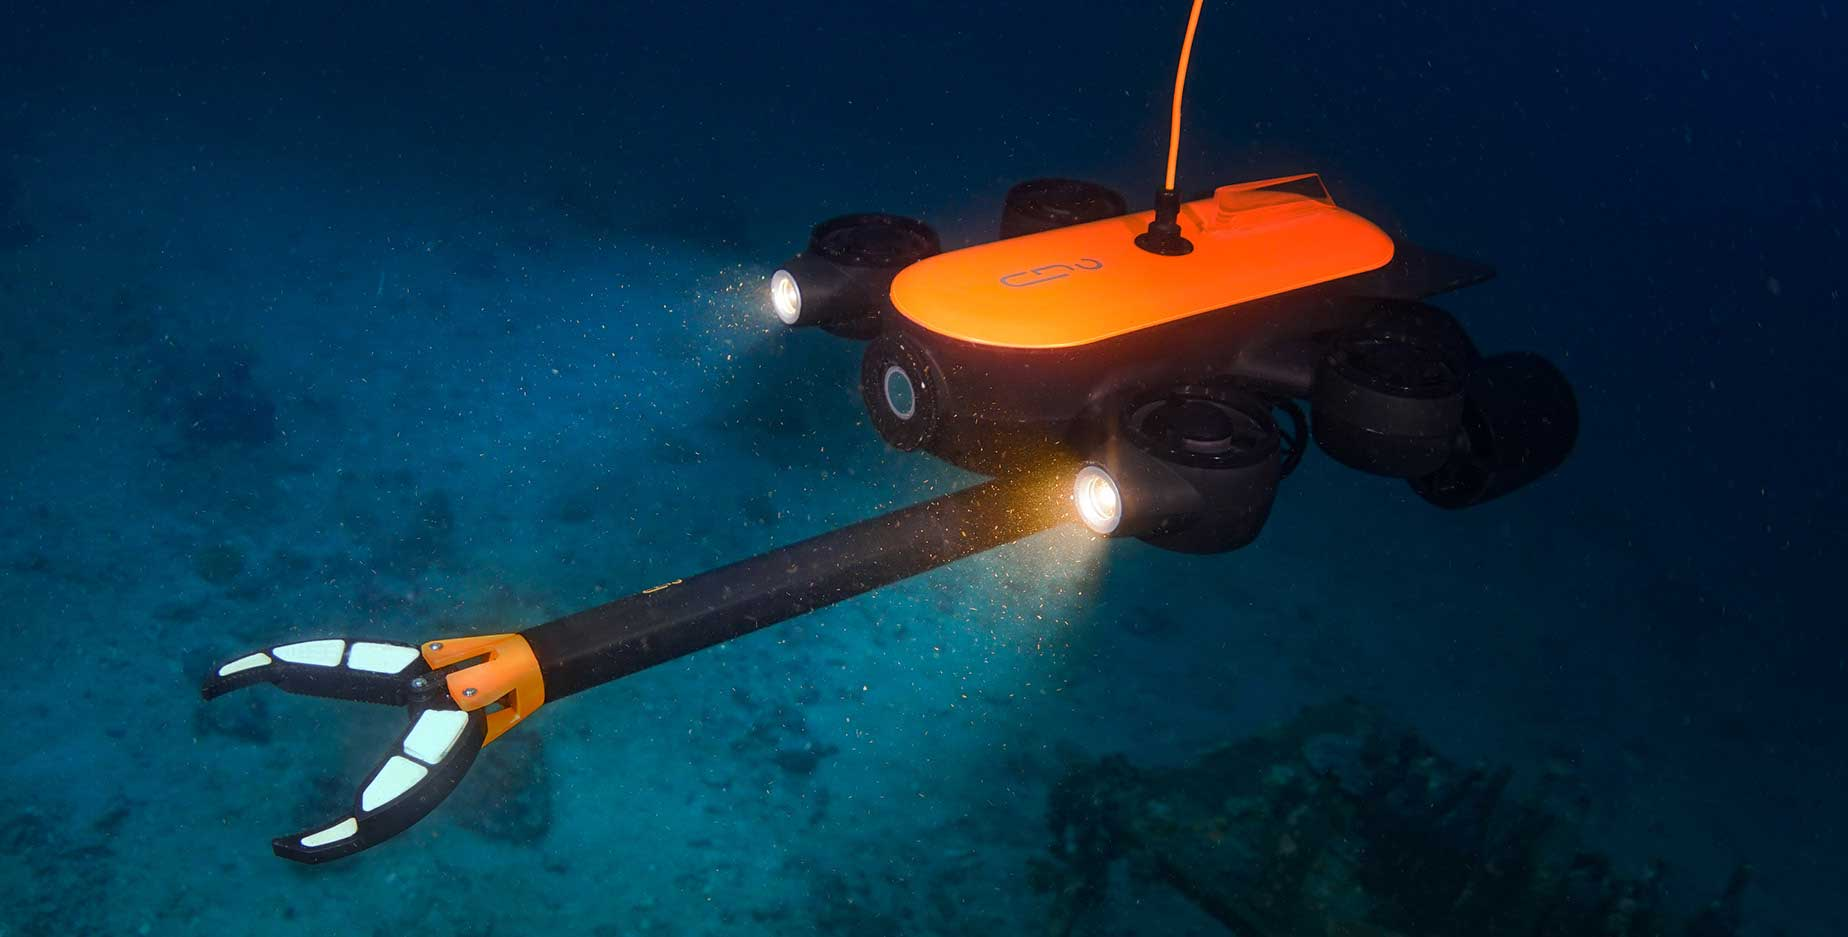 geneinno-titan-underwater-drone-claw-robotic-arm.jpg